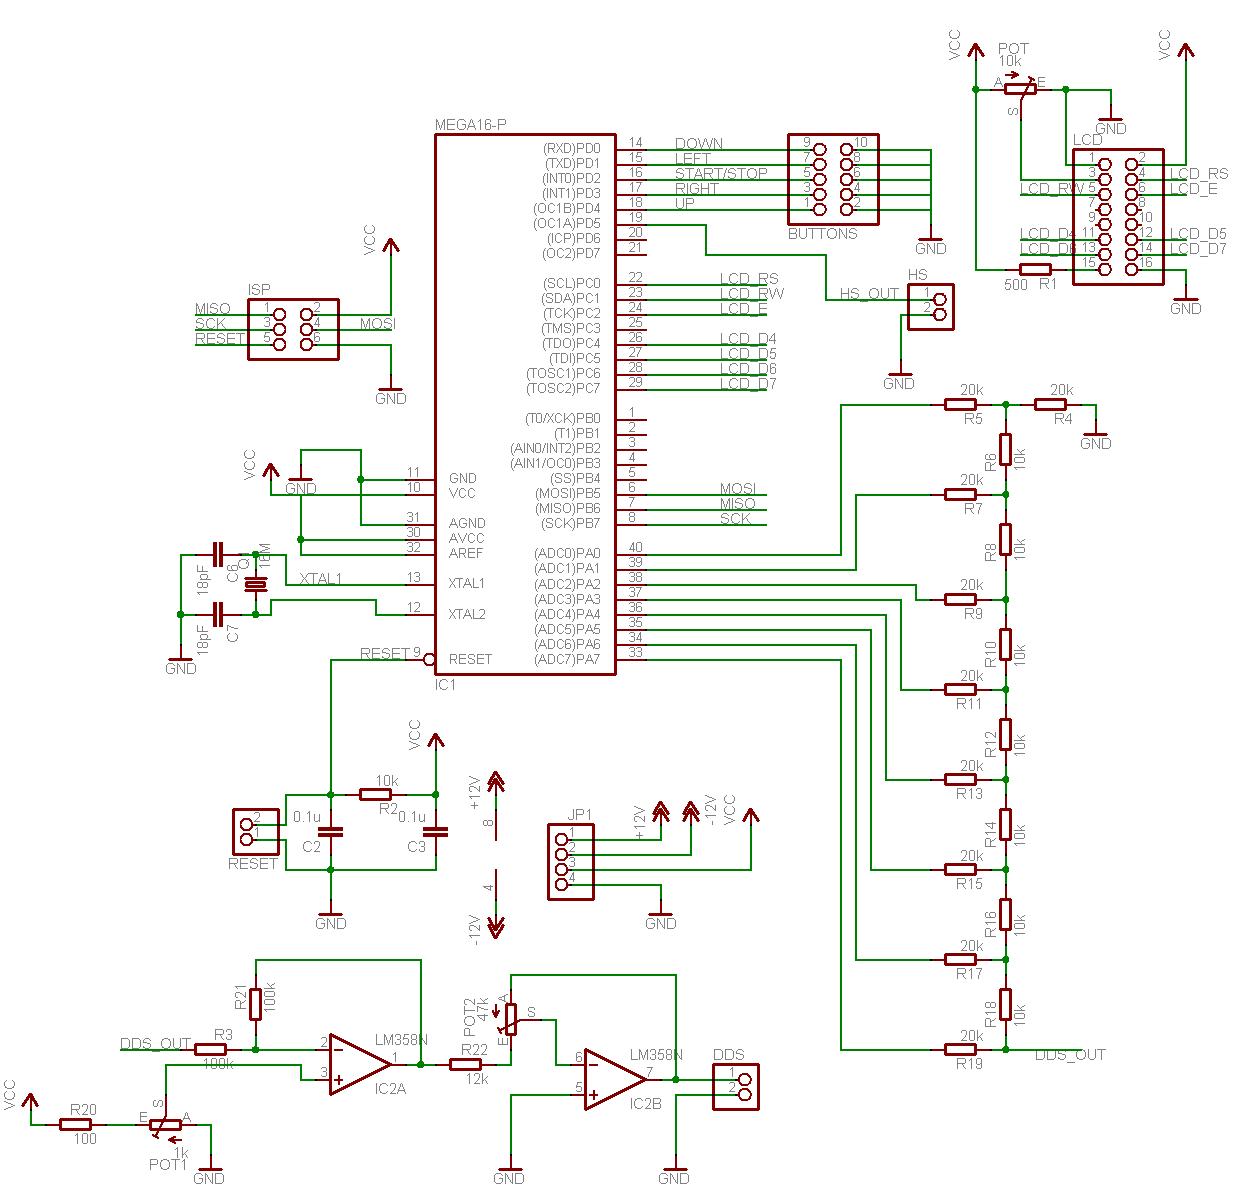 sr7 avr wiring diagram carling dpdt rocker switch dds signal generator v2 part 1 schematic